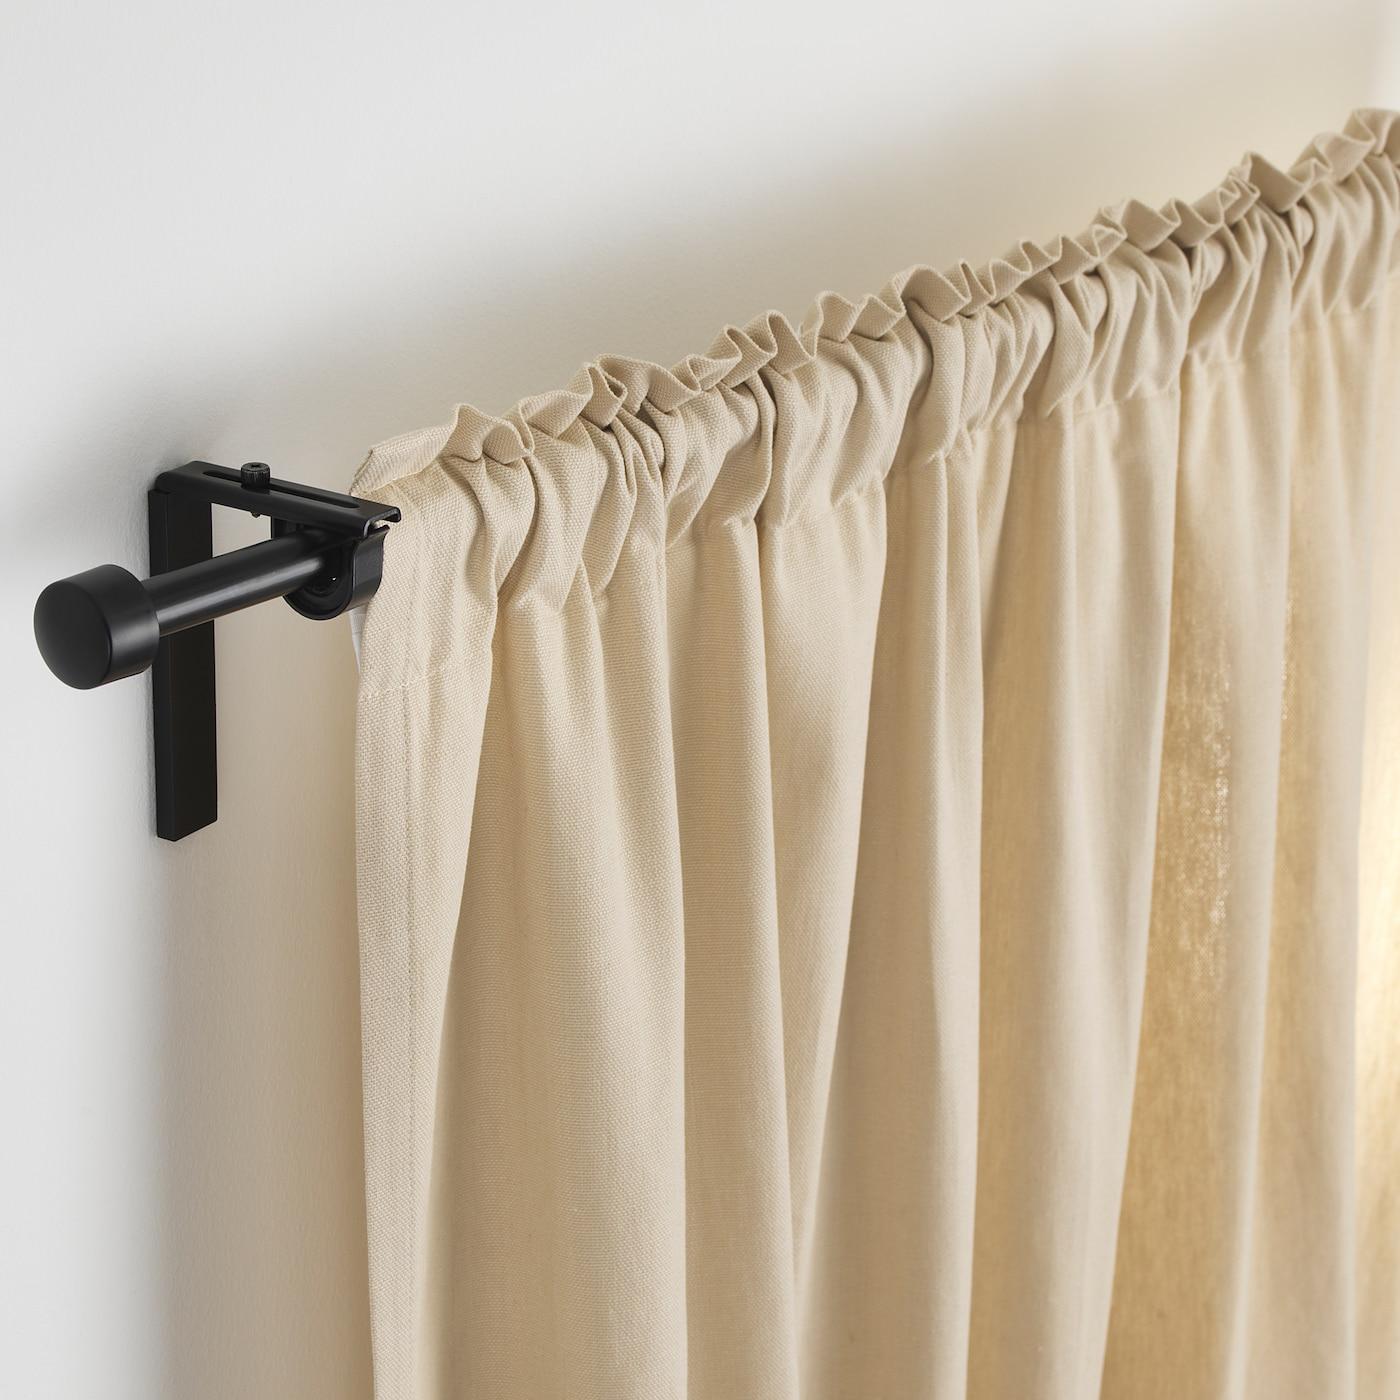 RÄcka Curtain Rod Combination Black Ikea